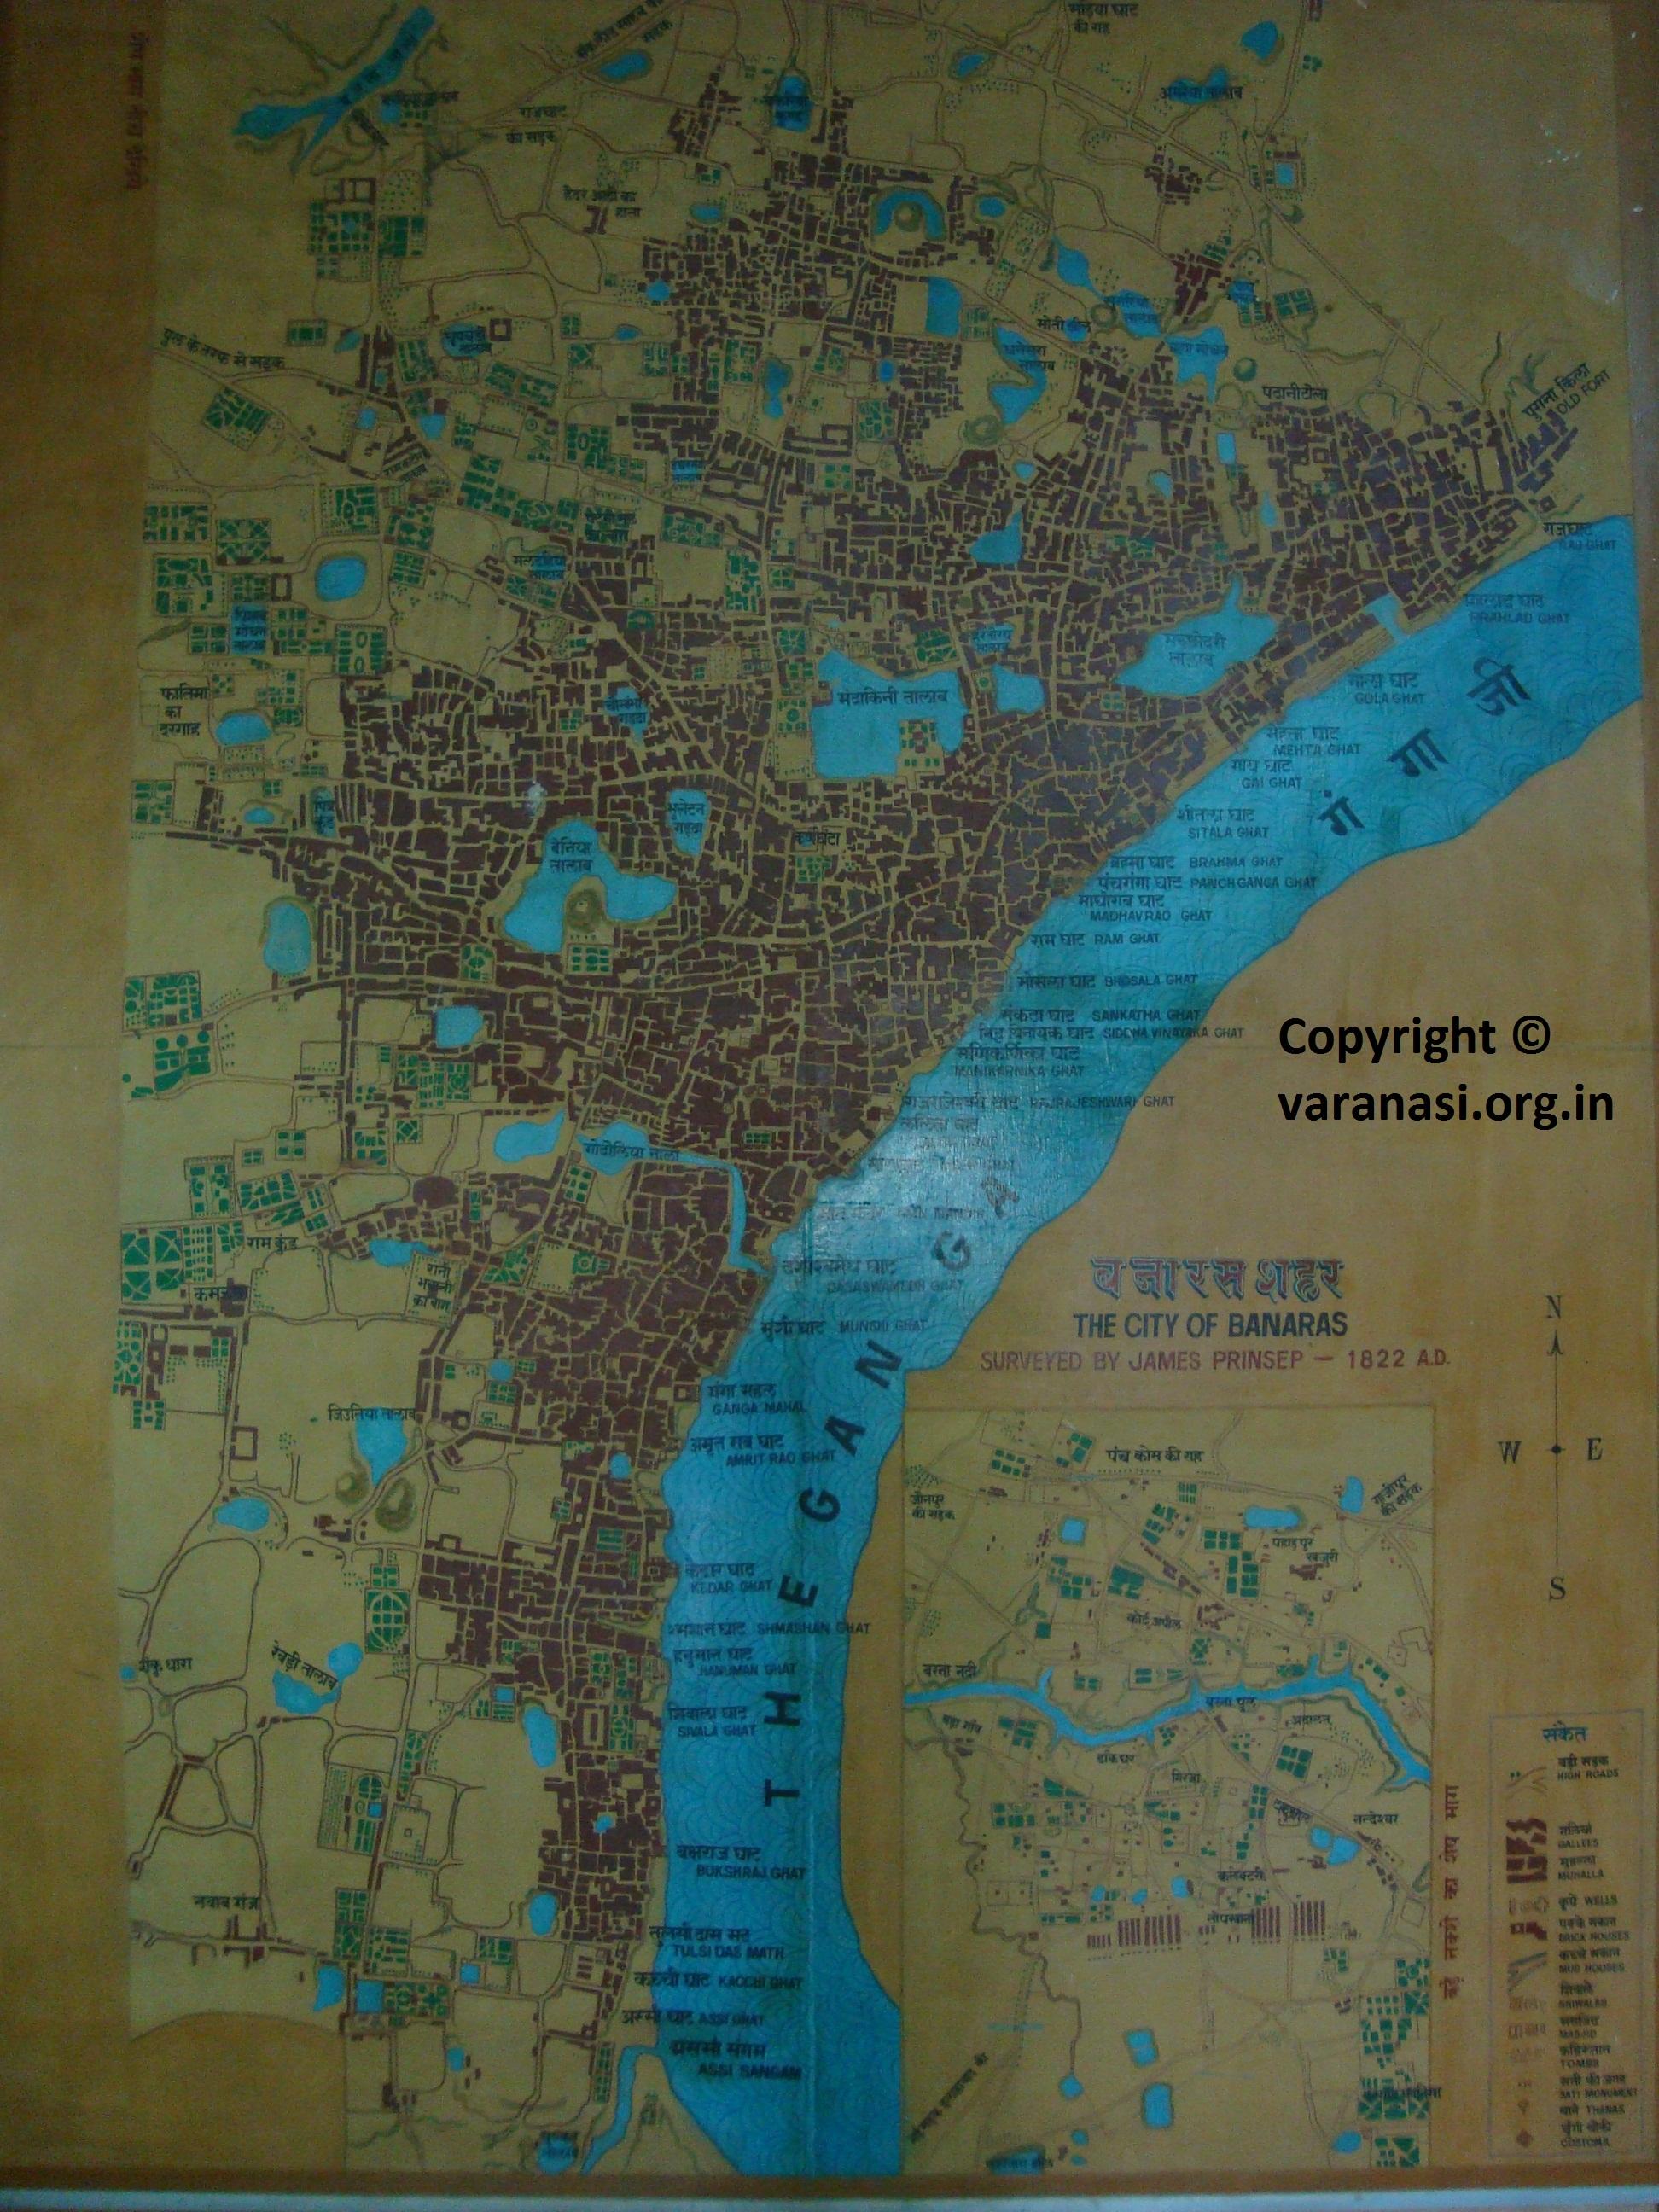 Varanasi Map Map Of Varanasi Varanasi City Satellite Map - Varanasi map